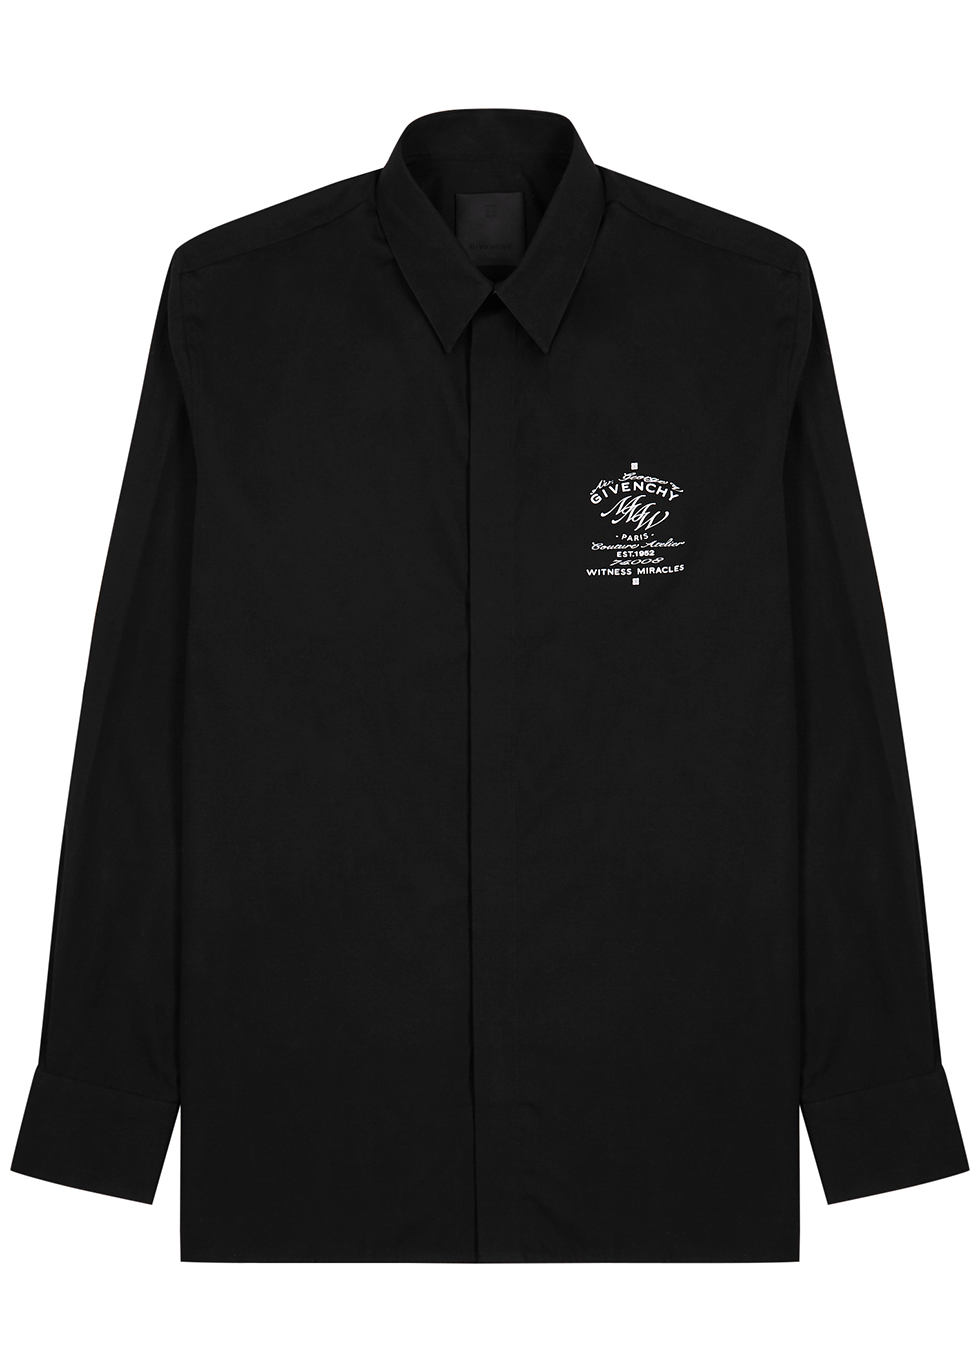 MMW black cotton shirt